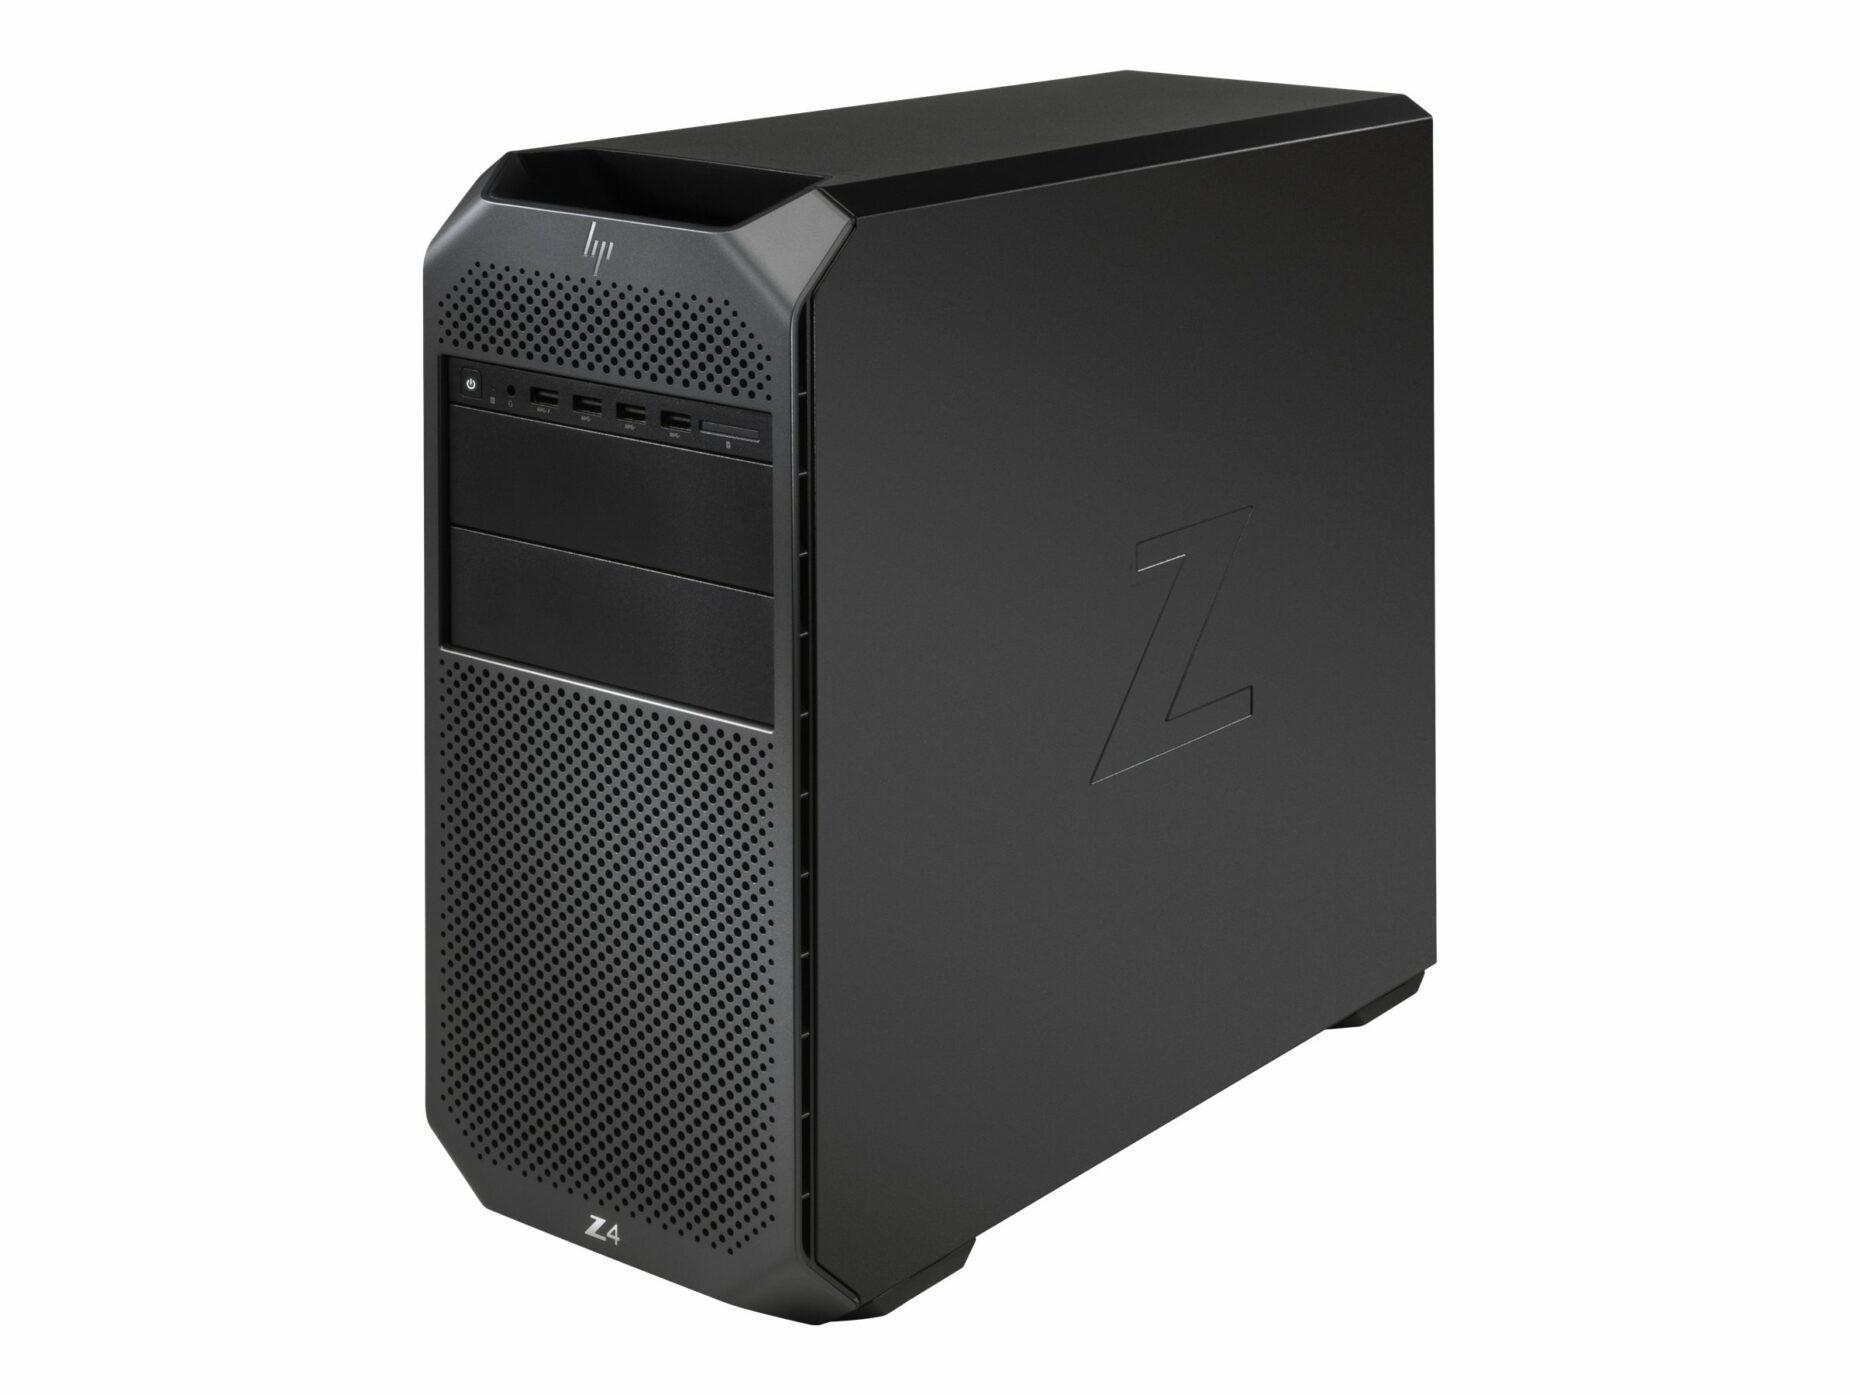 HP Workstation Z4 G4 - Xeon W-2102 - RAM 8 GB - HDD 1 TB - Windows 10 Pro - Mini Tower Desktop